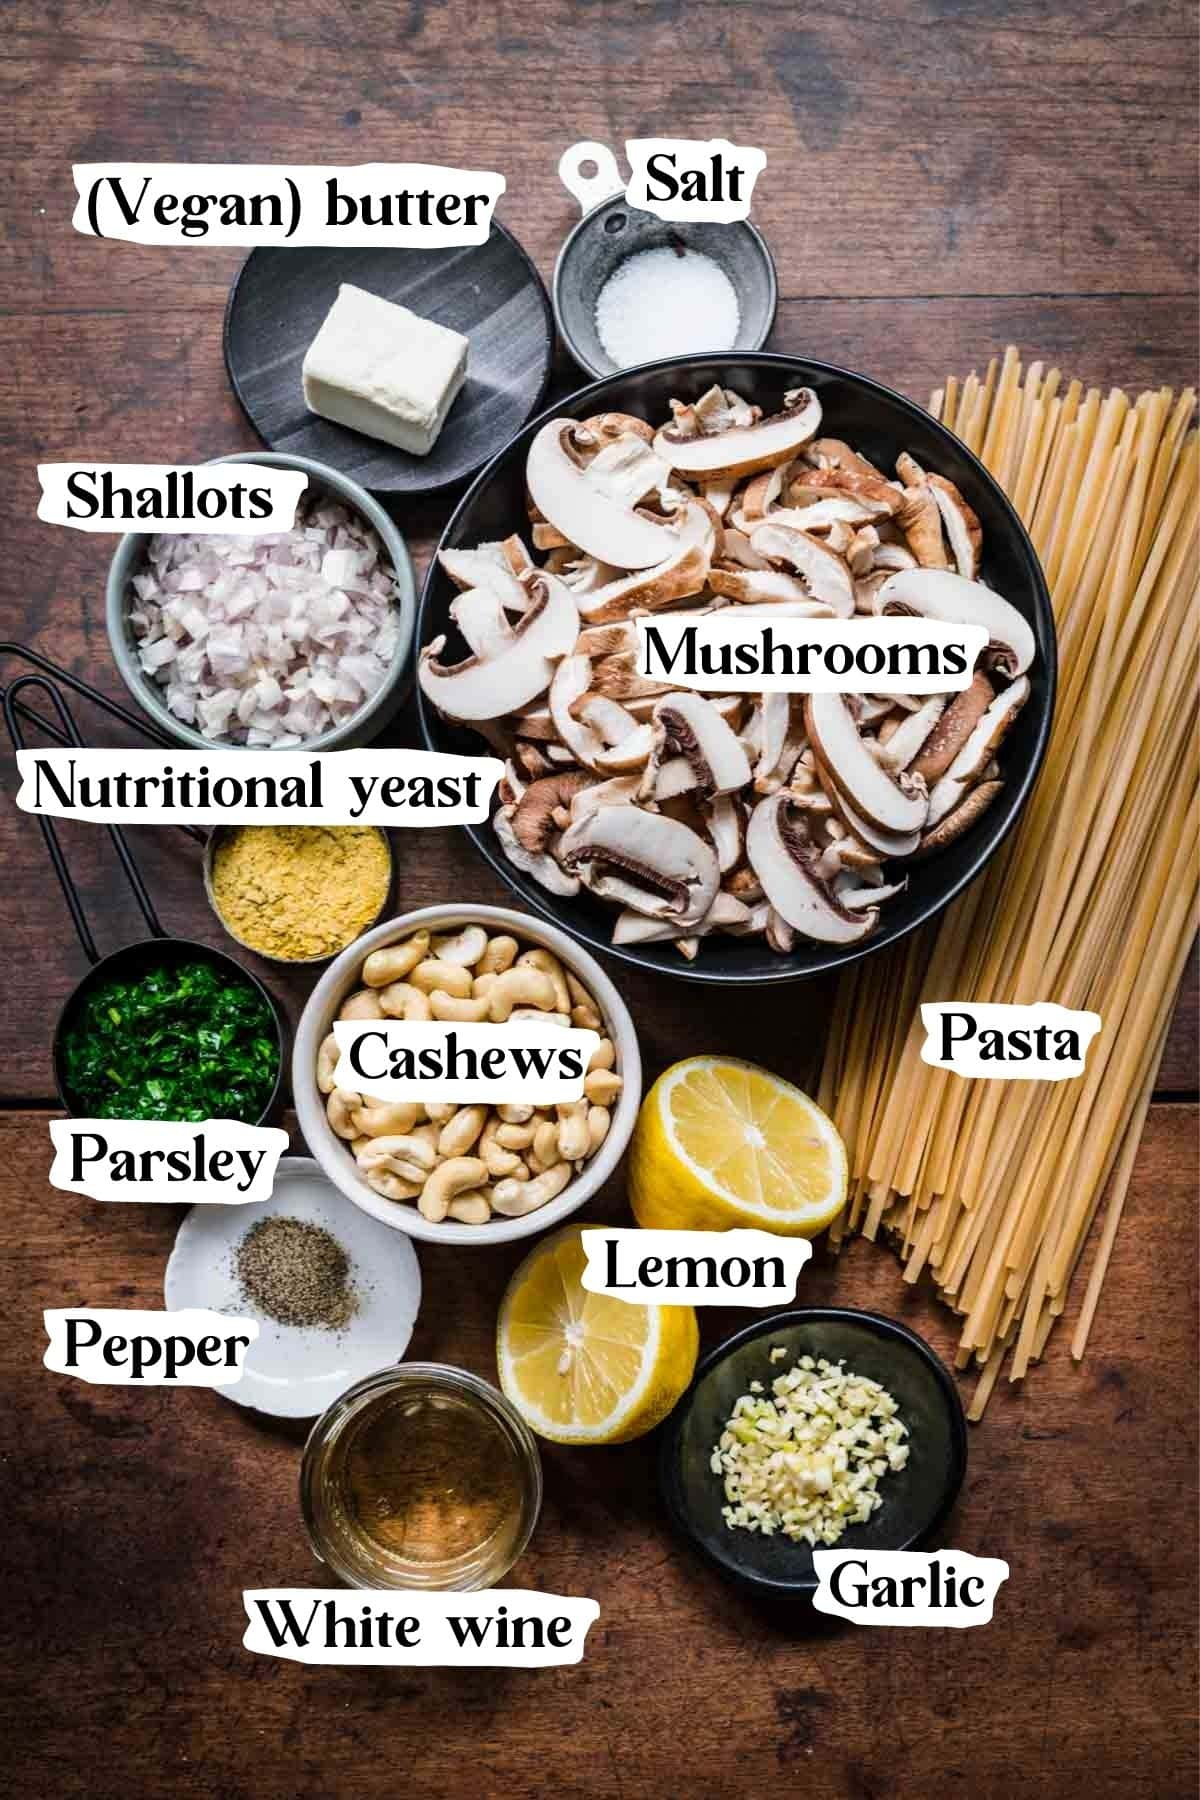 Overhead view of mushroom alfredo ingredients, including pasta, mushrooms, cashews, and parsley.